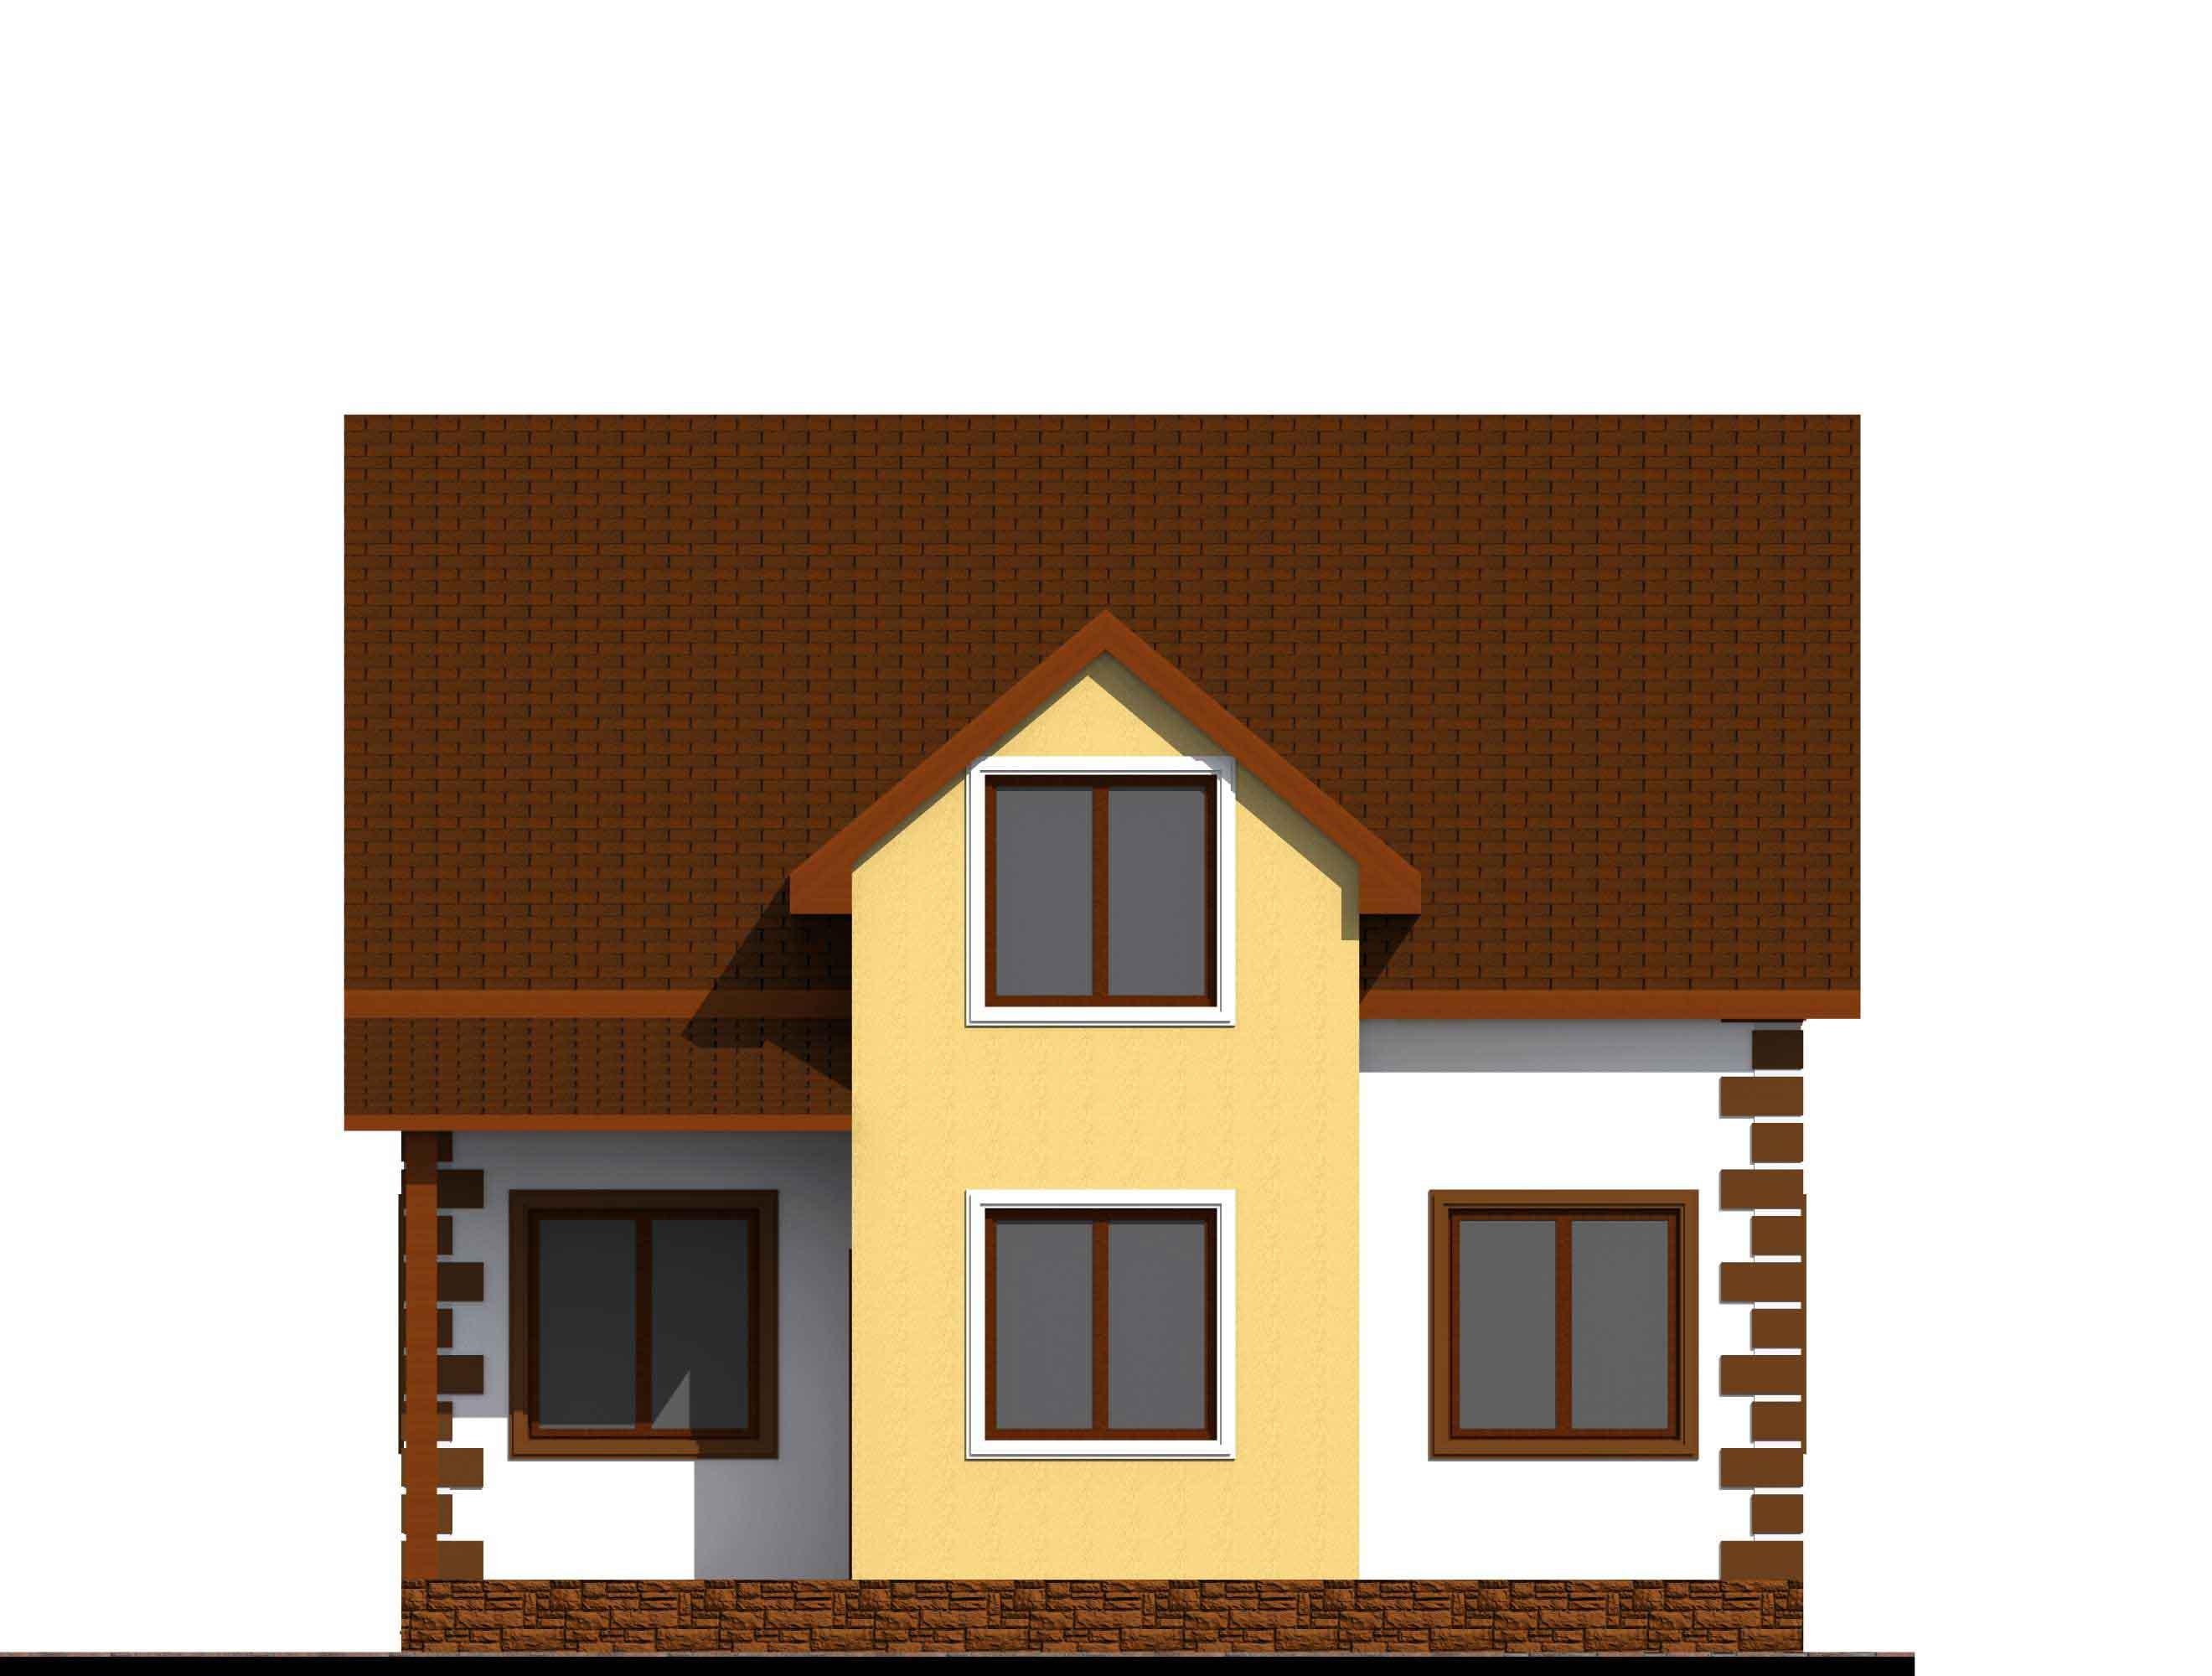 Проект каркасного дома 163 квадратных метра вид спереди